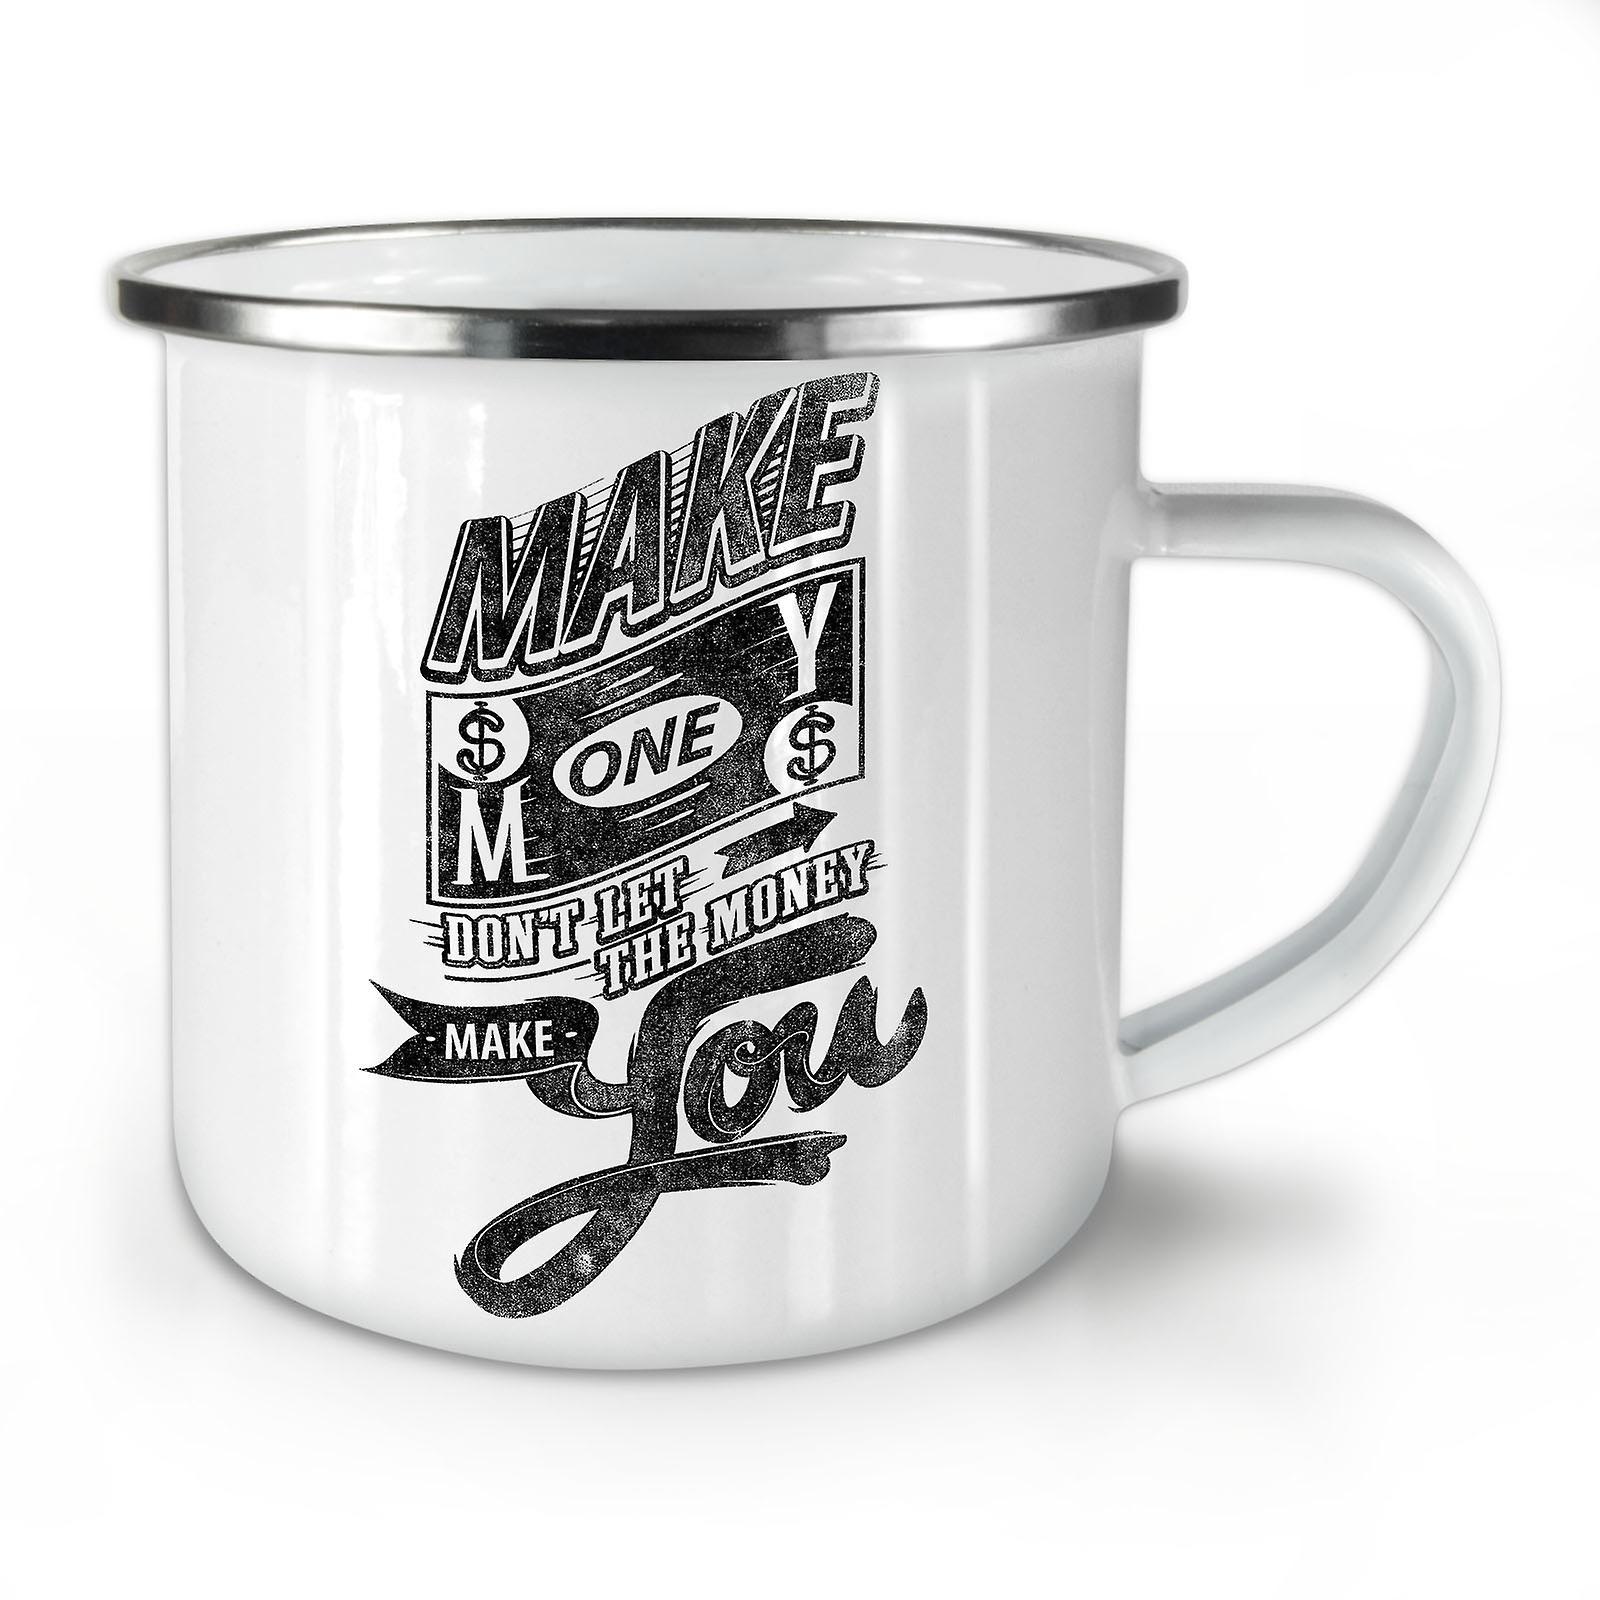 Faire D'argent Mug10 Nouveau Émail Le Dollar Whitetea Café OzWellcoda yv8mNn0wO